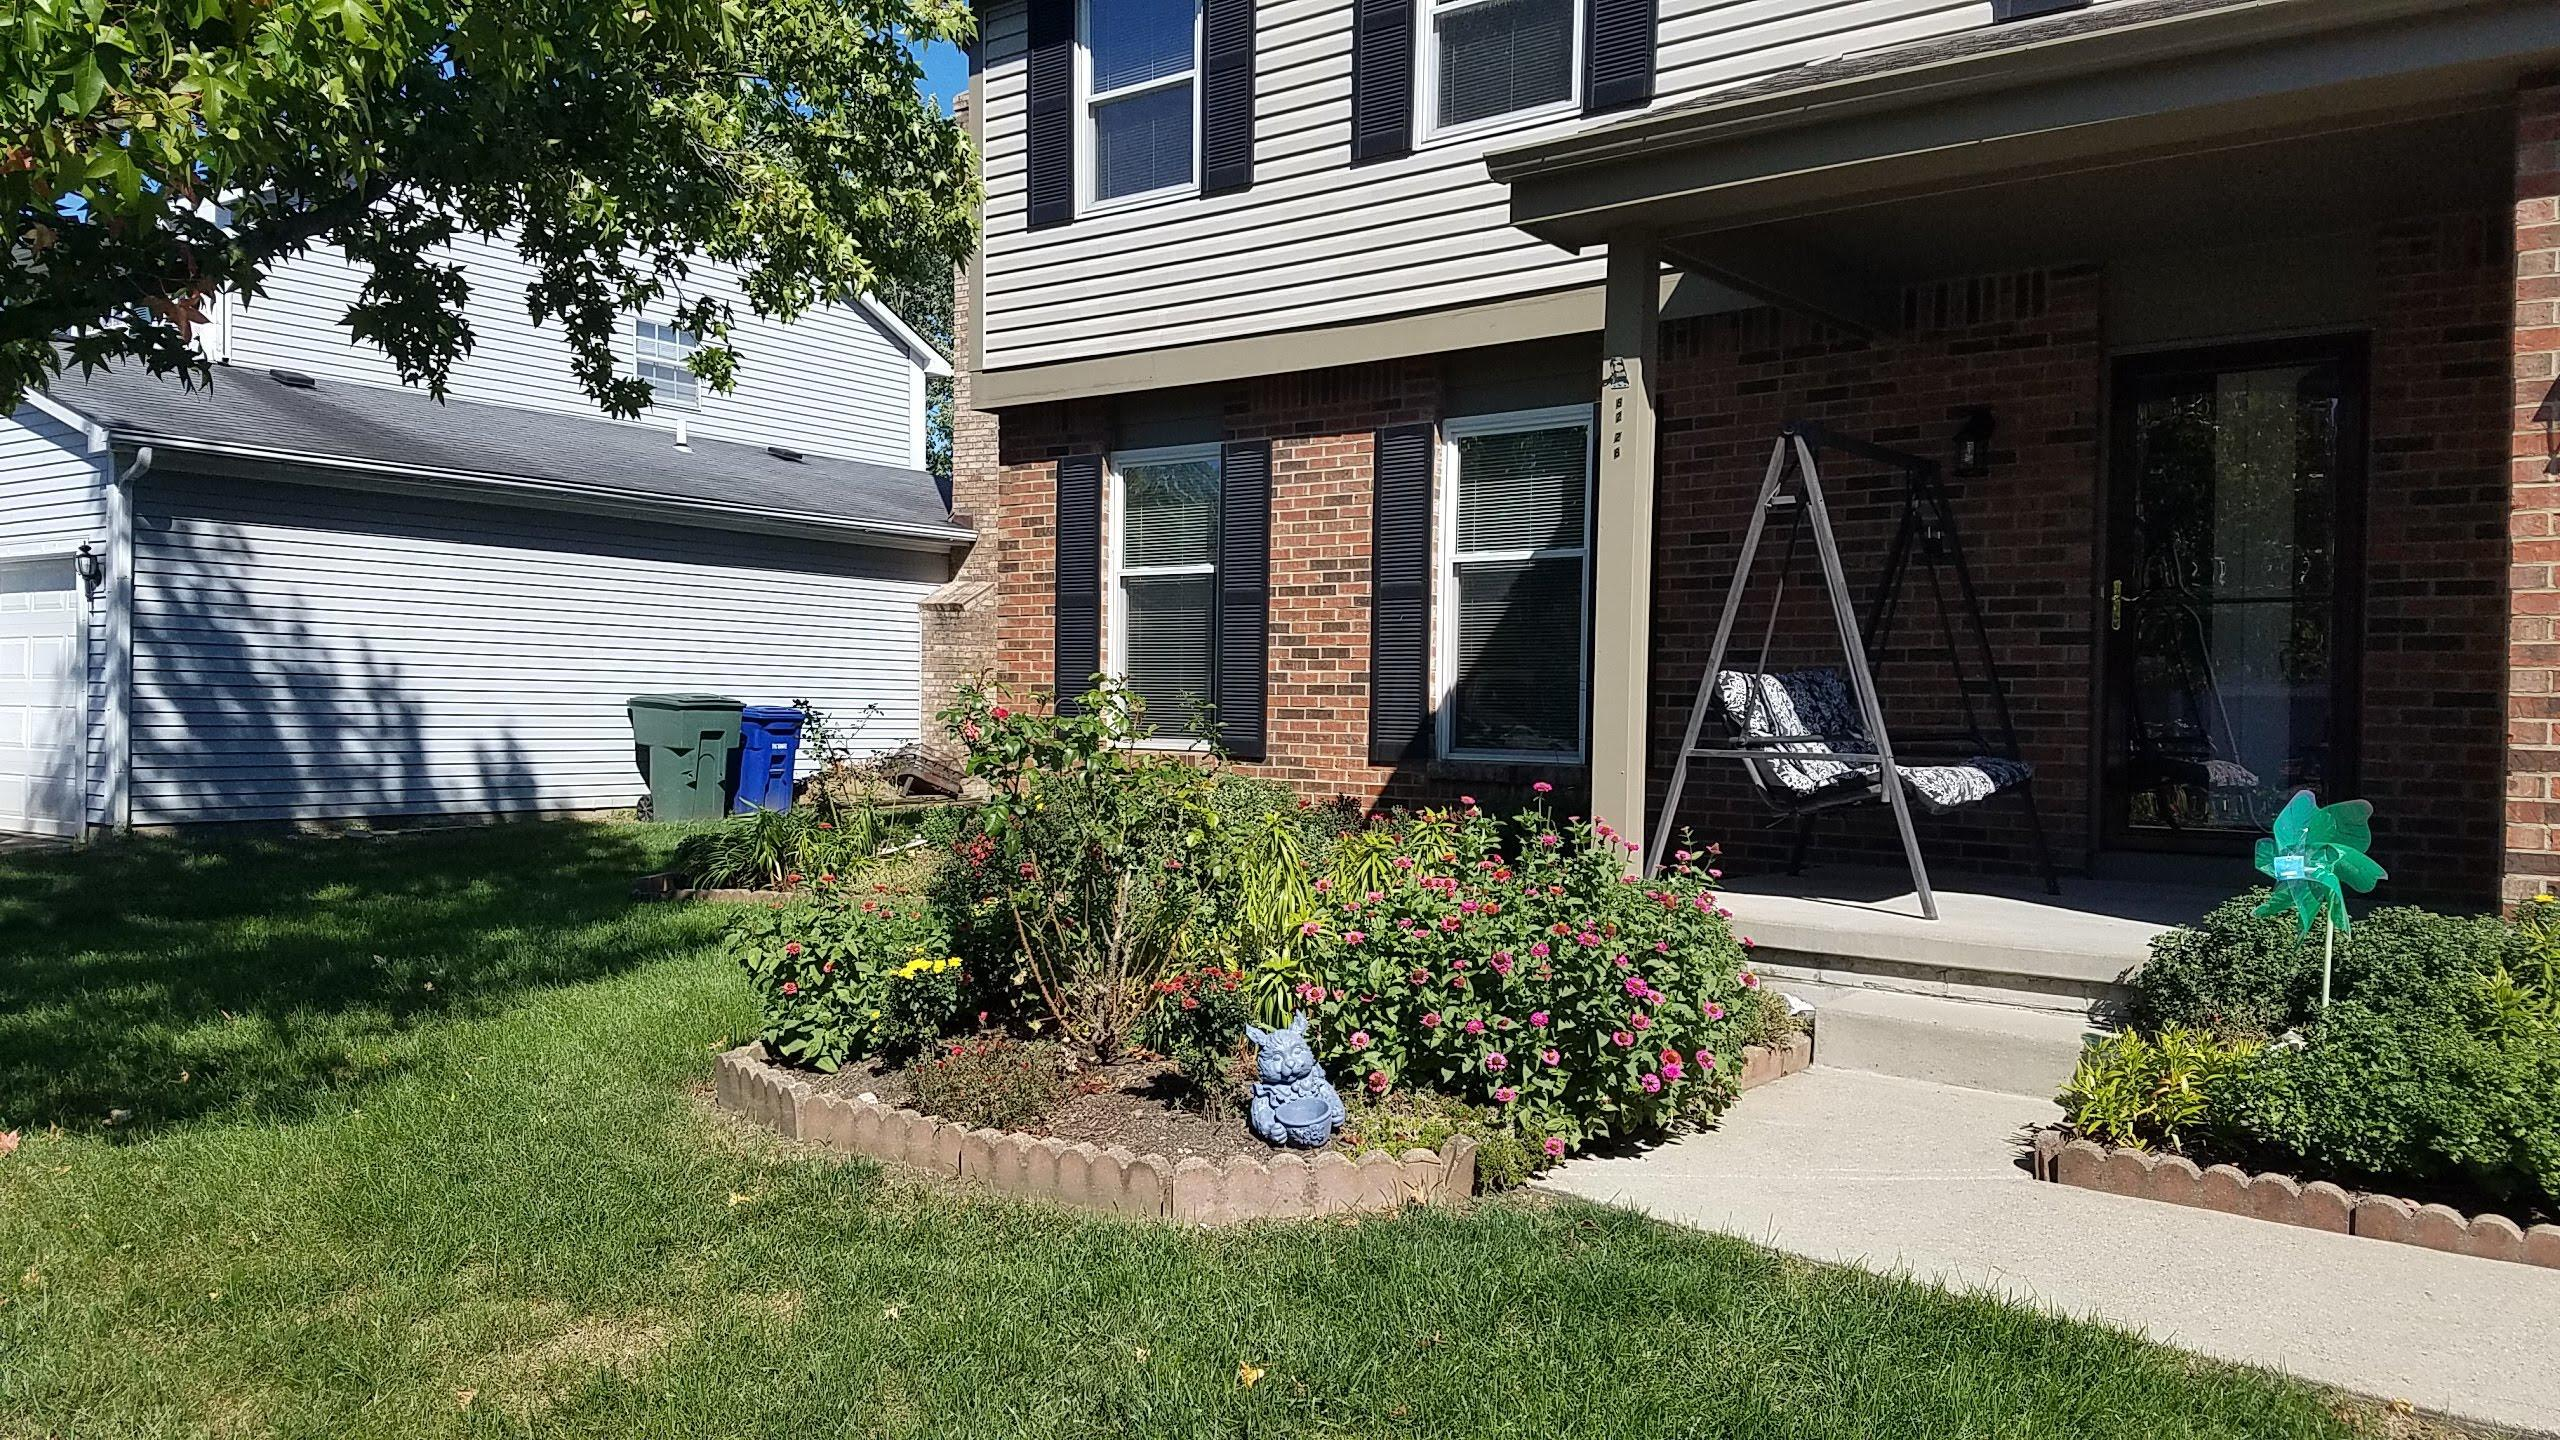 8228 Storrow Drive, Westerville, Ohio 43081, 4 Bedrooms Bedrooms, ,3 BathroomsBathrooms,Residential,For Sale,Storrow,220031425